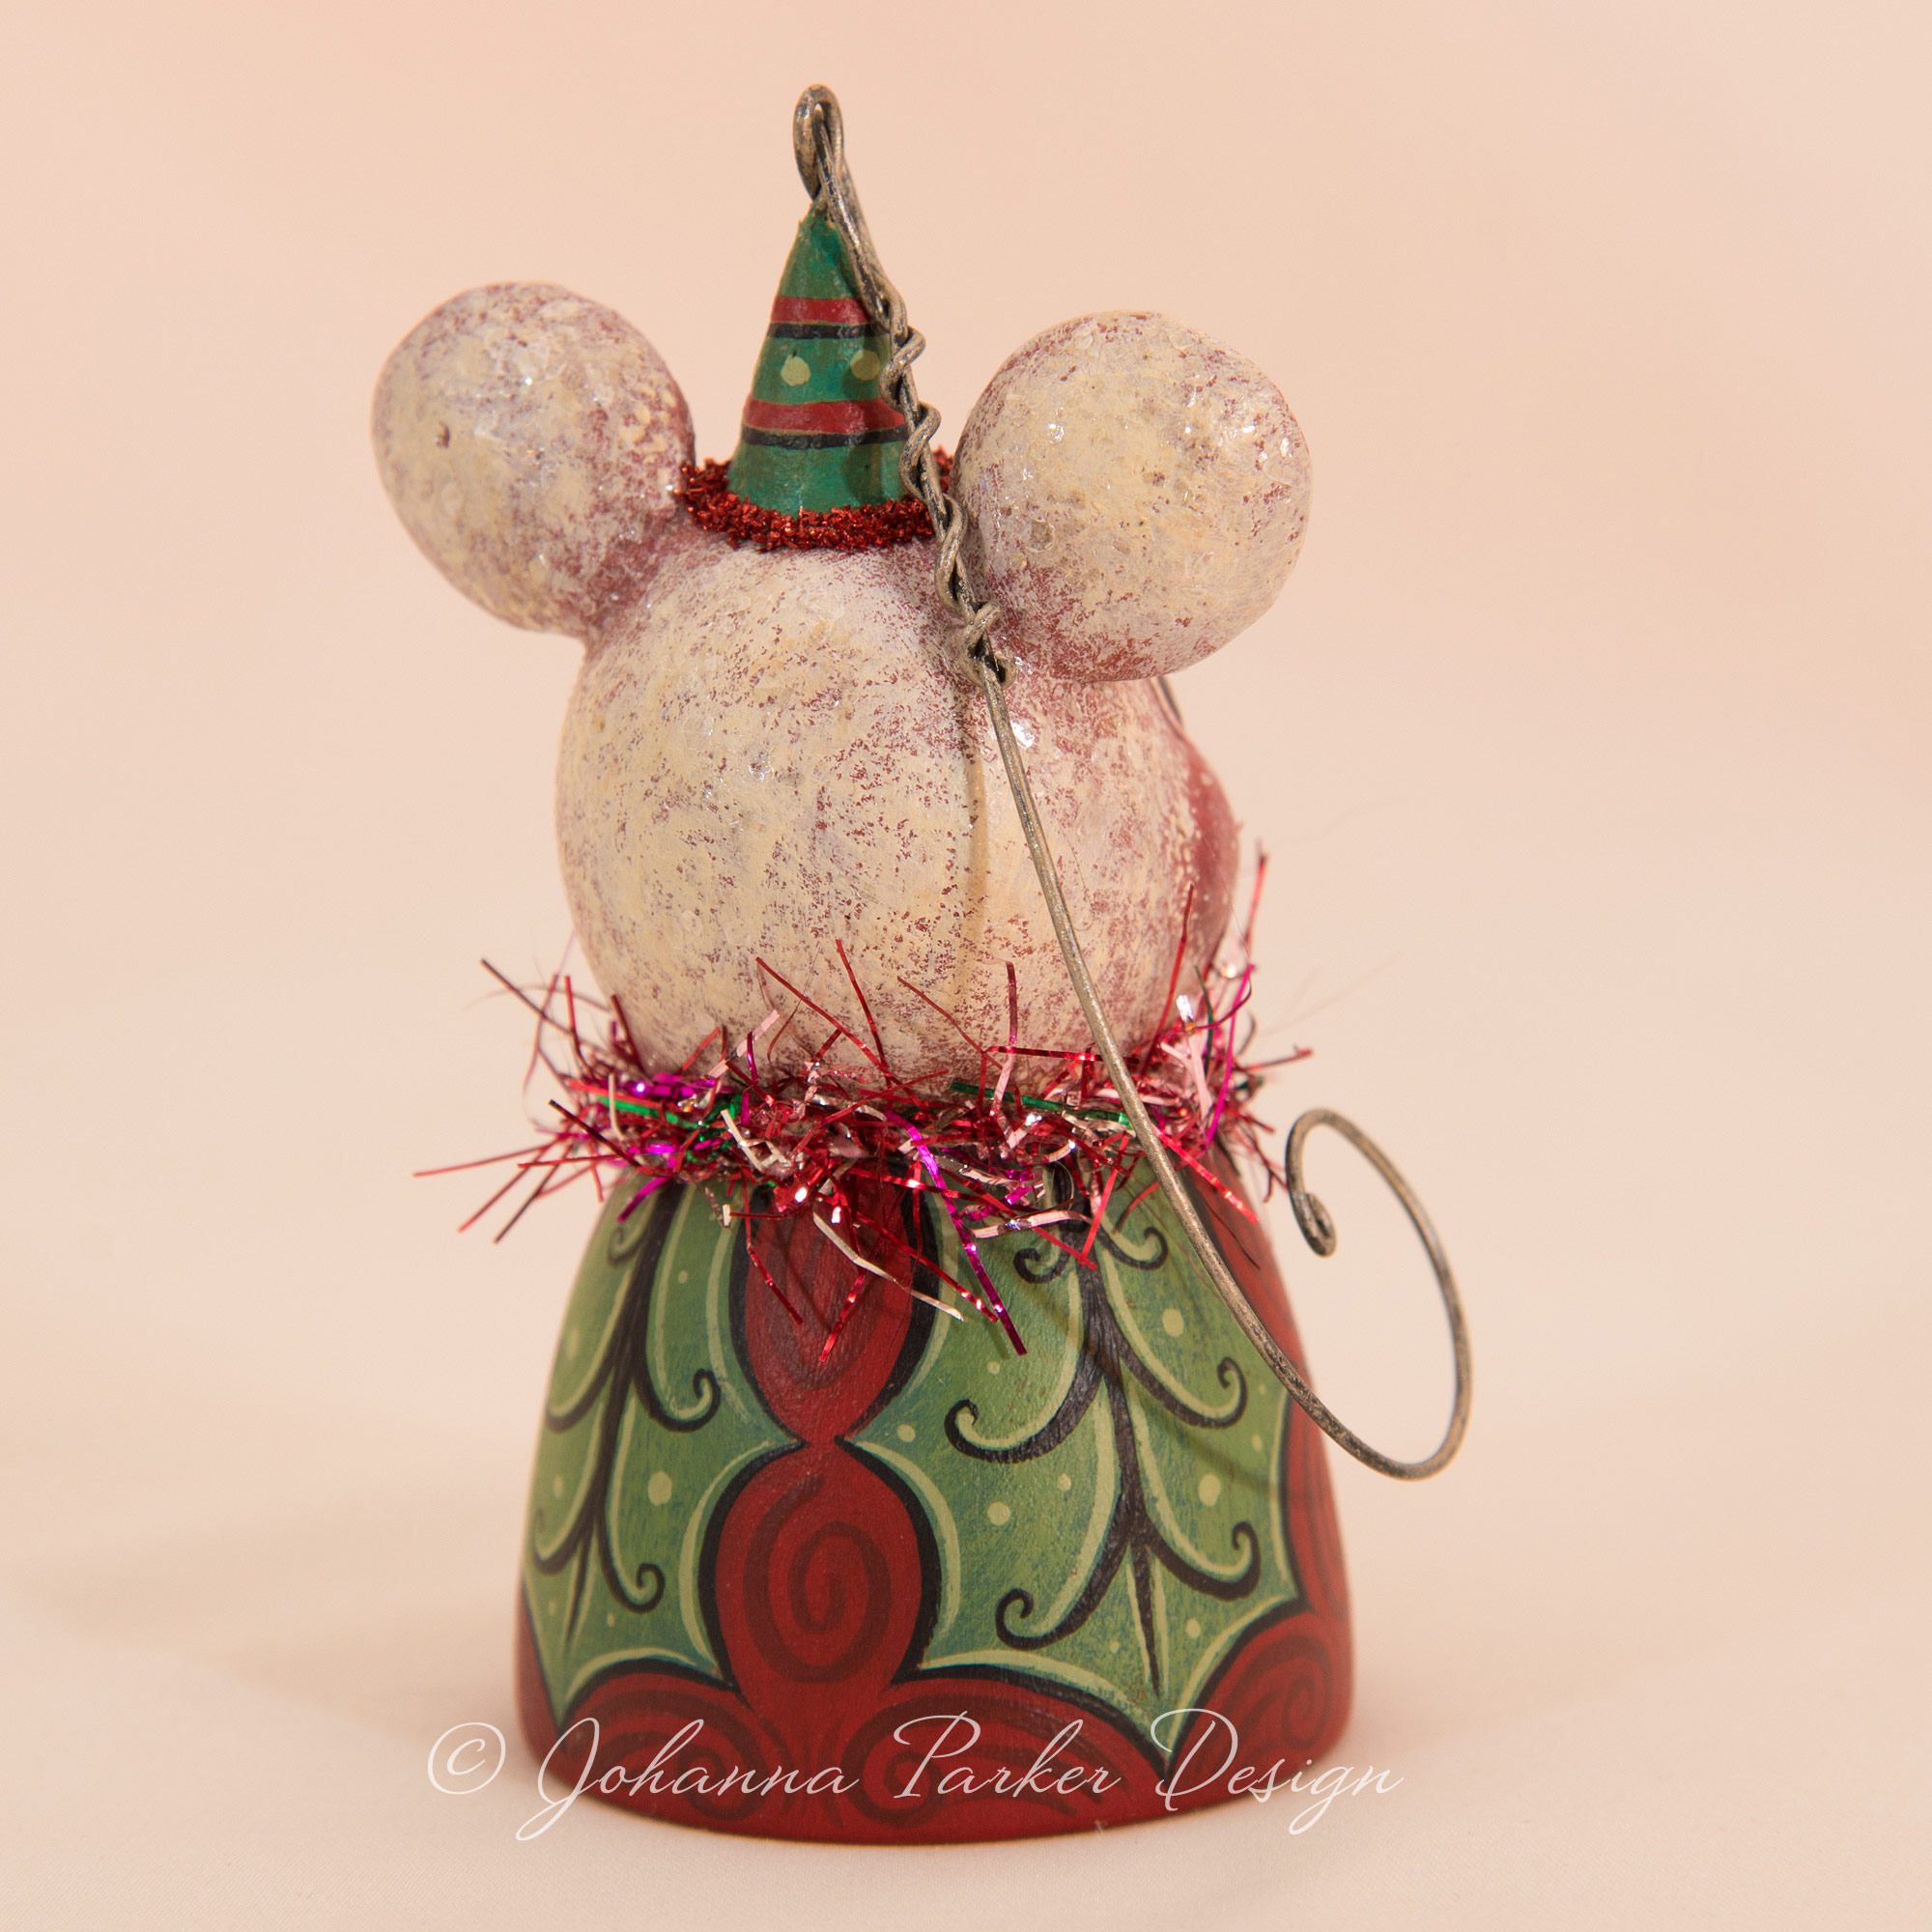 Johanna-Parker-Mouse-Ornament-Bell-5.jpg